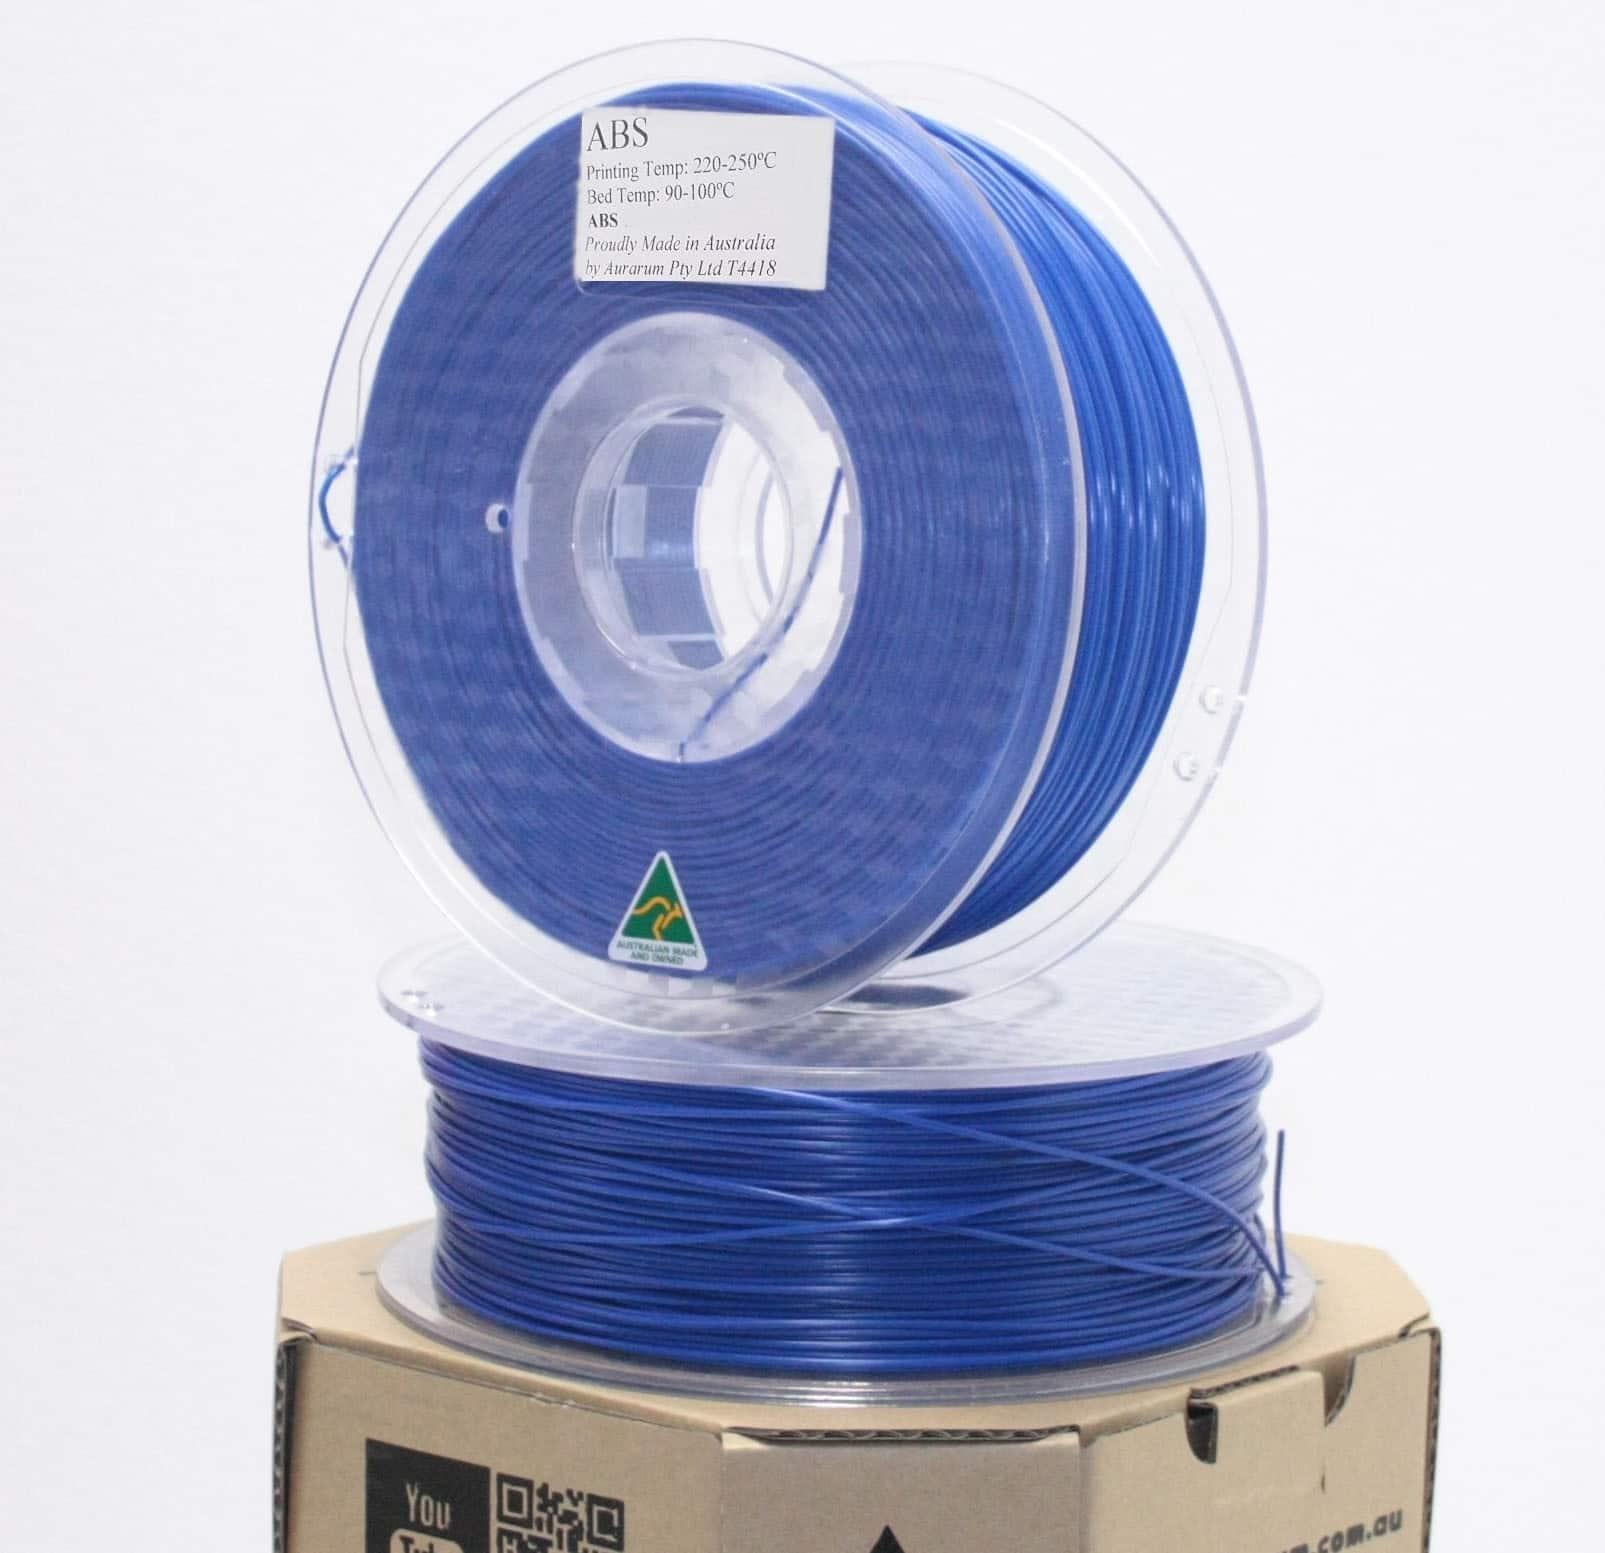 Aurarum ABS 3D Printer Filament - Denim Blue 2.85mm 1Kg